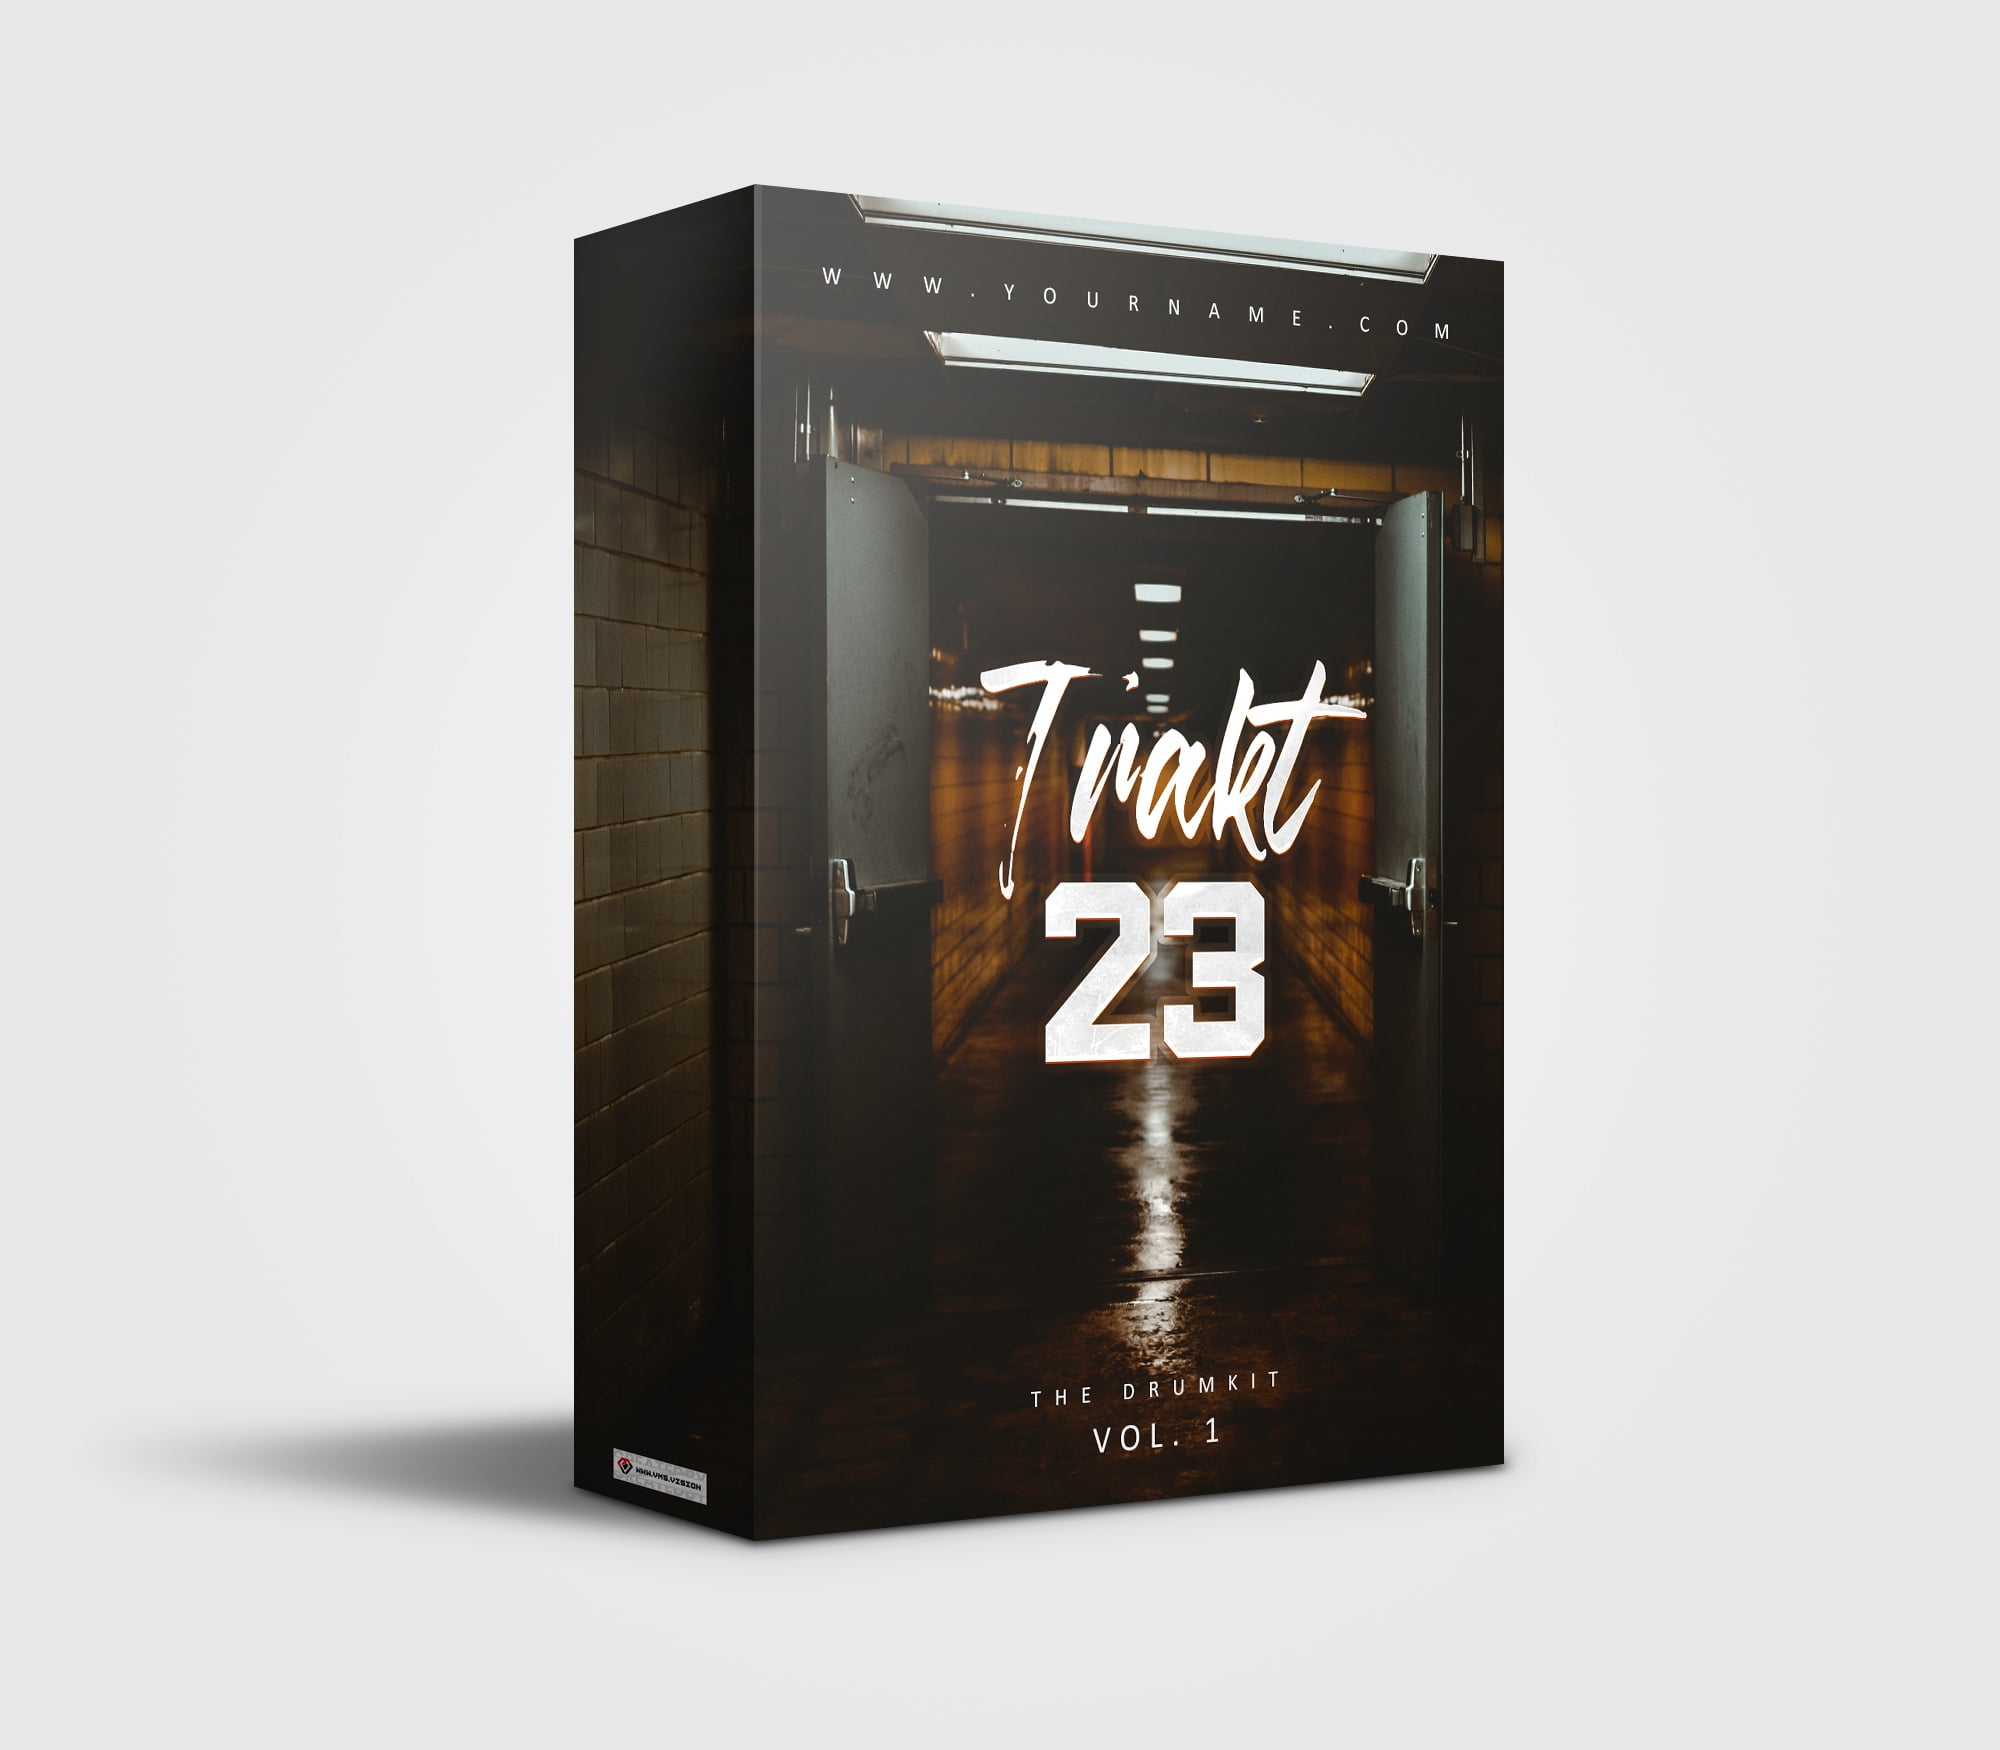 Trakt 23 premade Drumkit Box Design